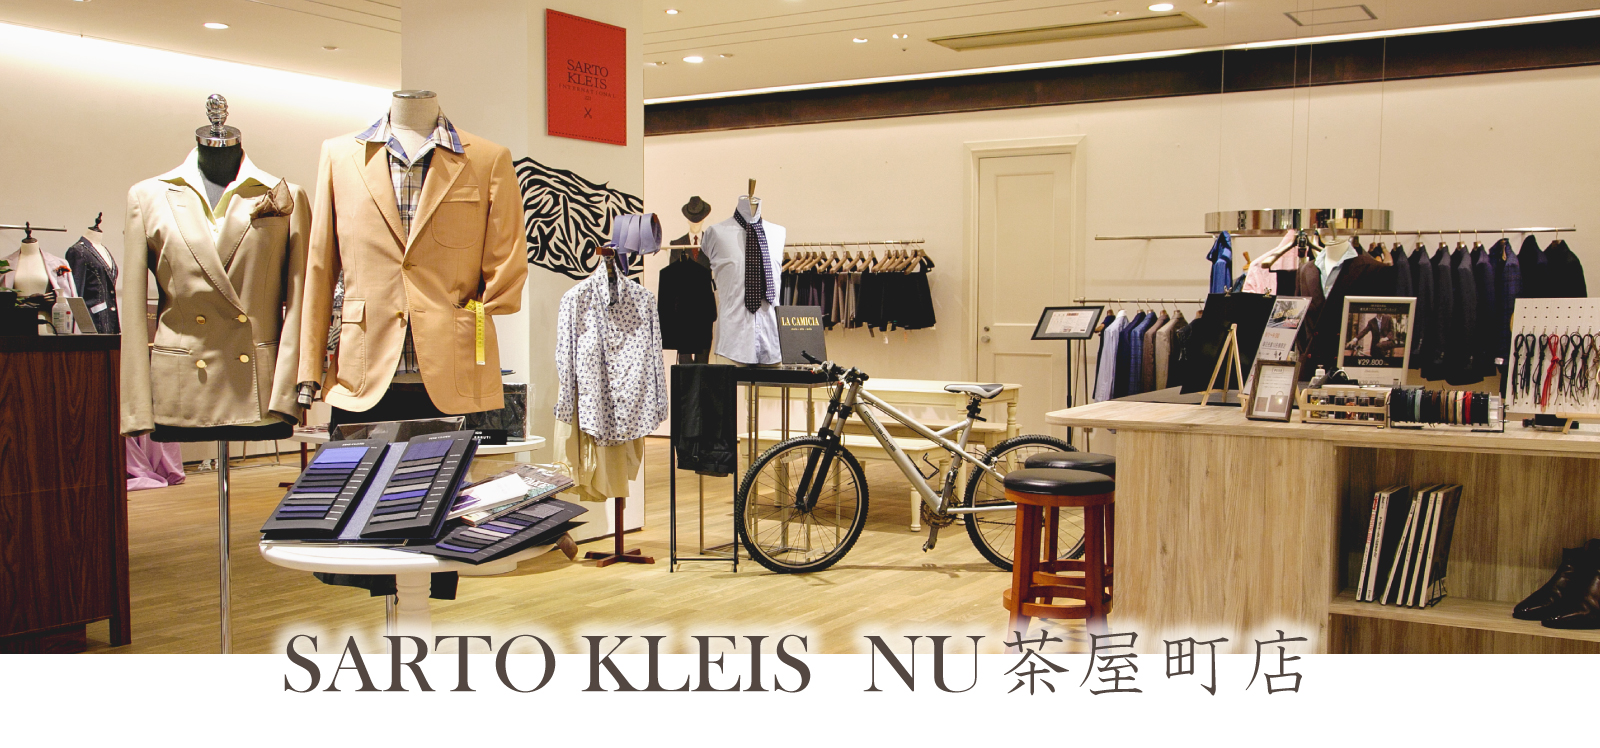 nu lp nushop - NU茶屋町店 N Products